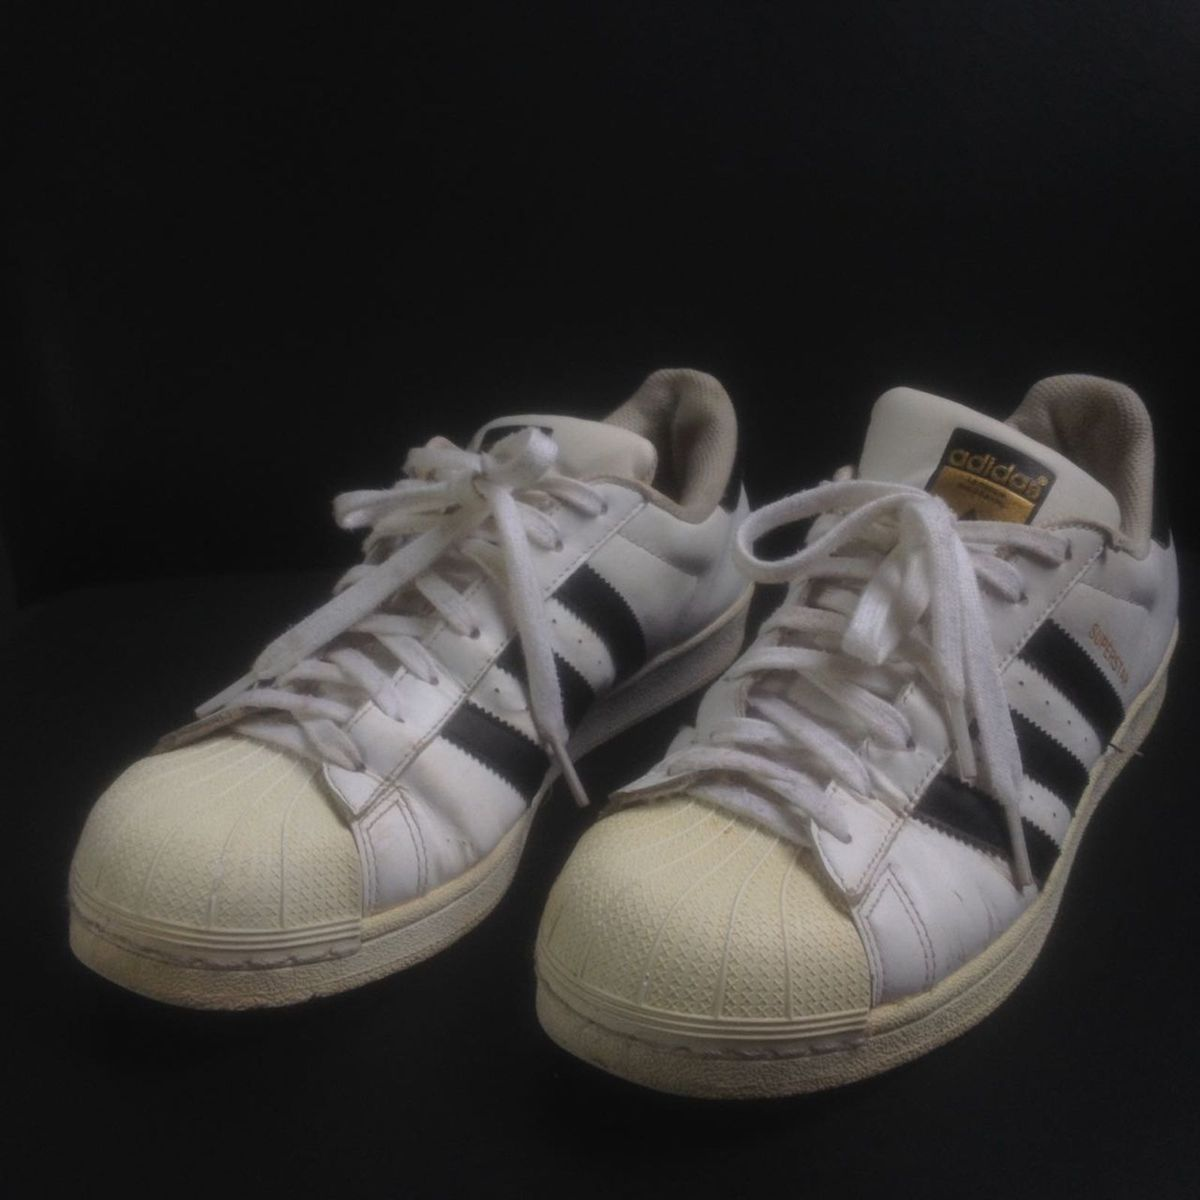 3c9b357a Tenis Adidas Superstar   Tênis Masculino Adidas Usado 28737064   enjoei